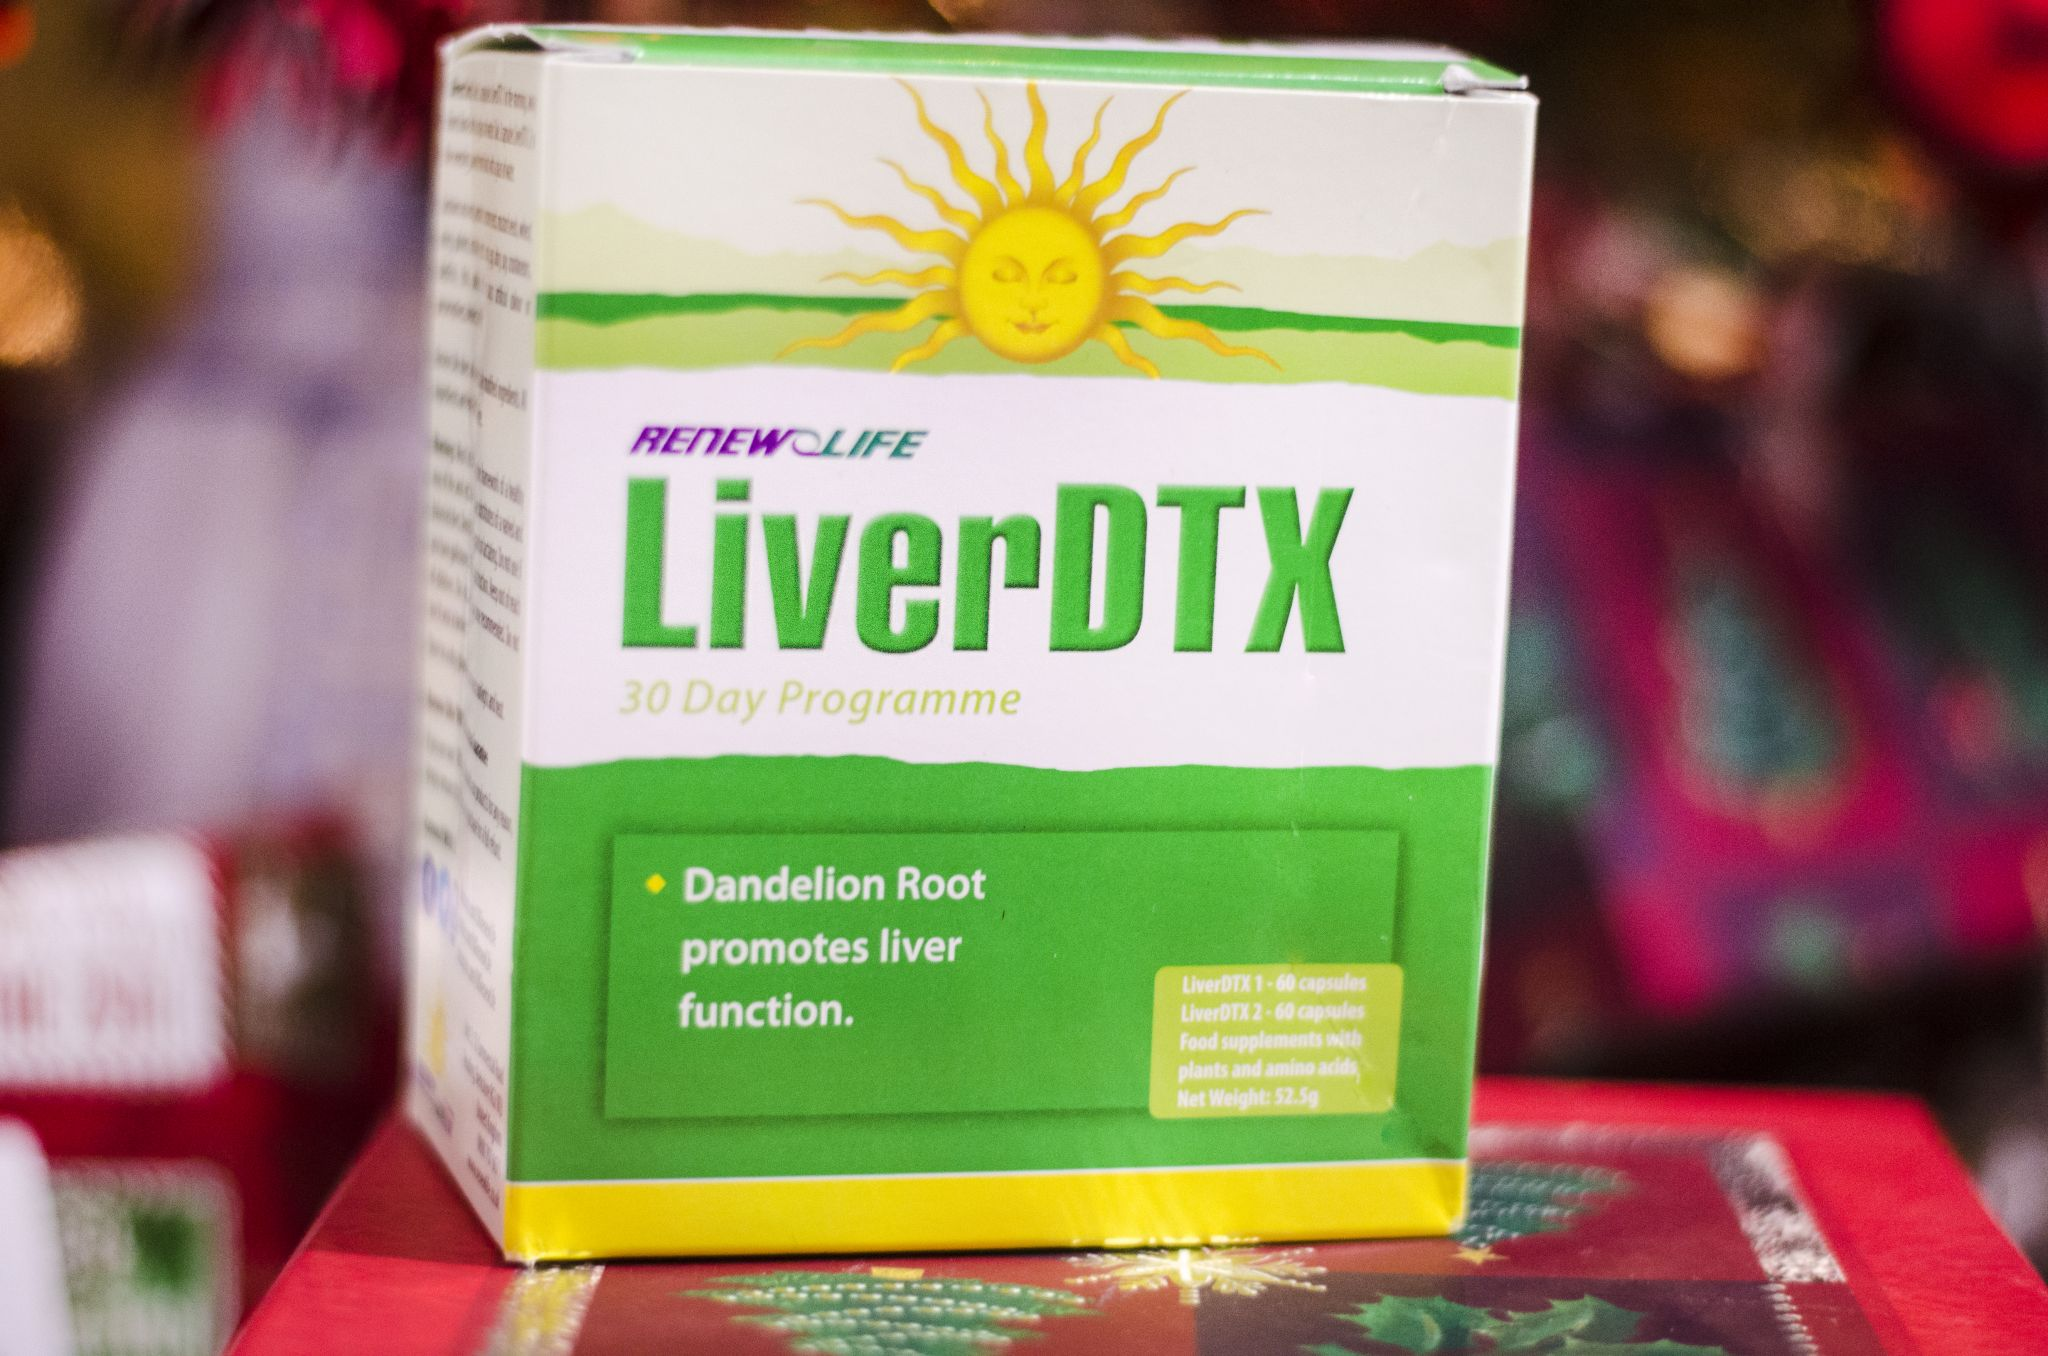 Liver detox at christmas